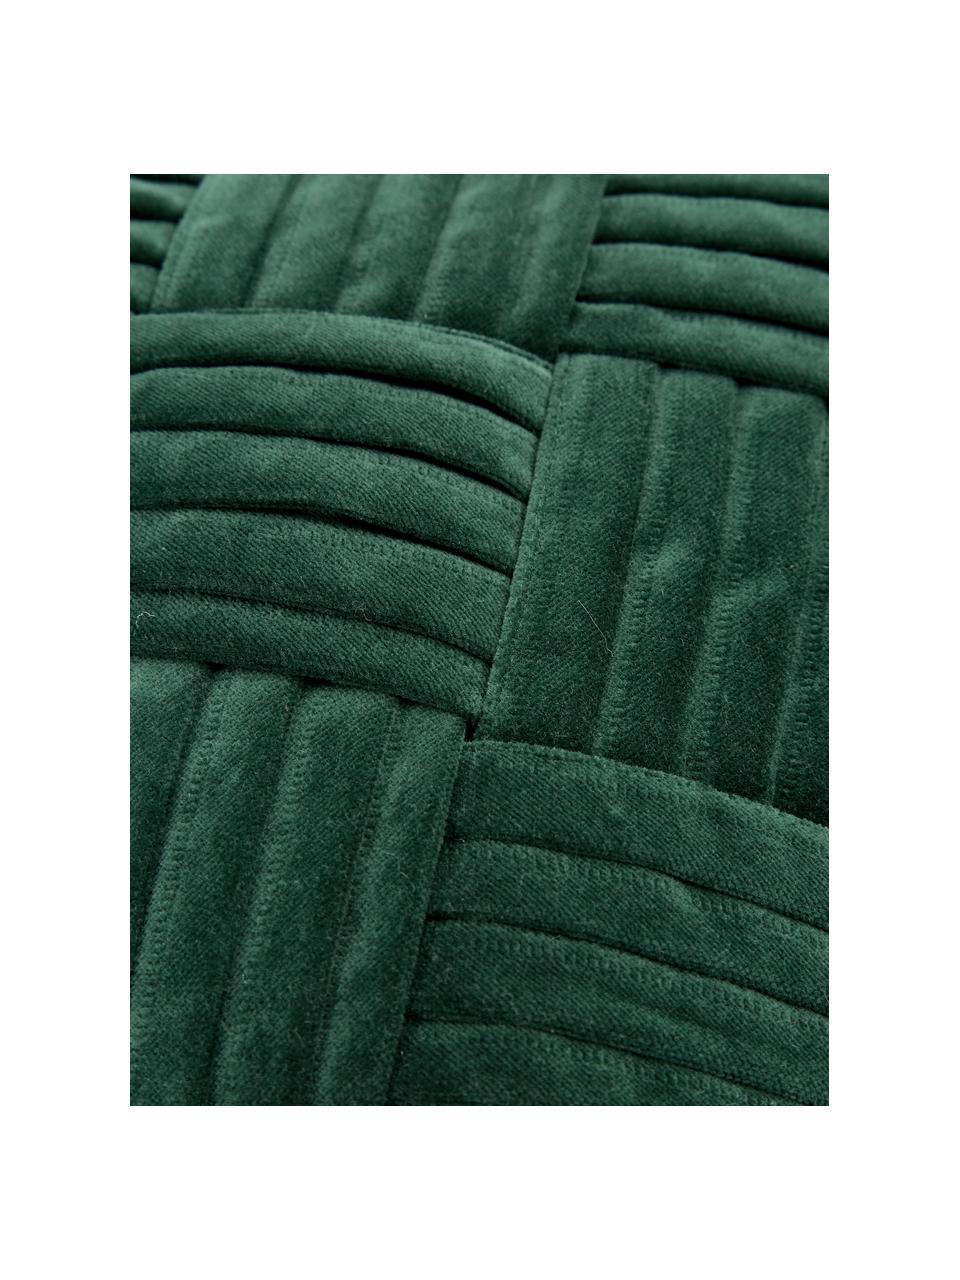 Samt-Kissenhülle Sina in Dunkelgrün mit Strukturmuster, Samt (100% Baumwolle), Grün, 45 x 45 cm